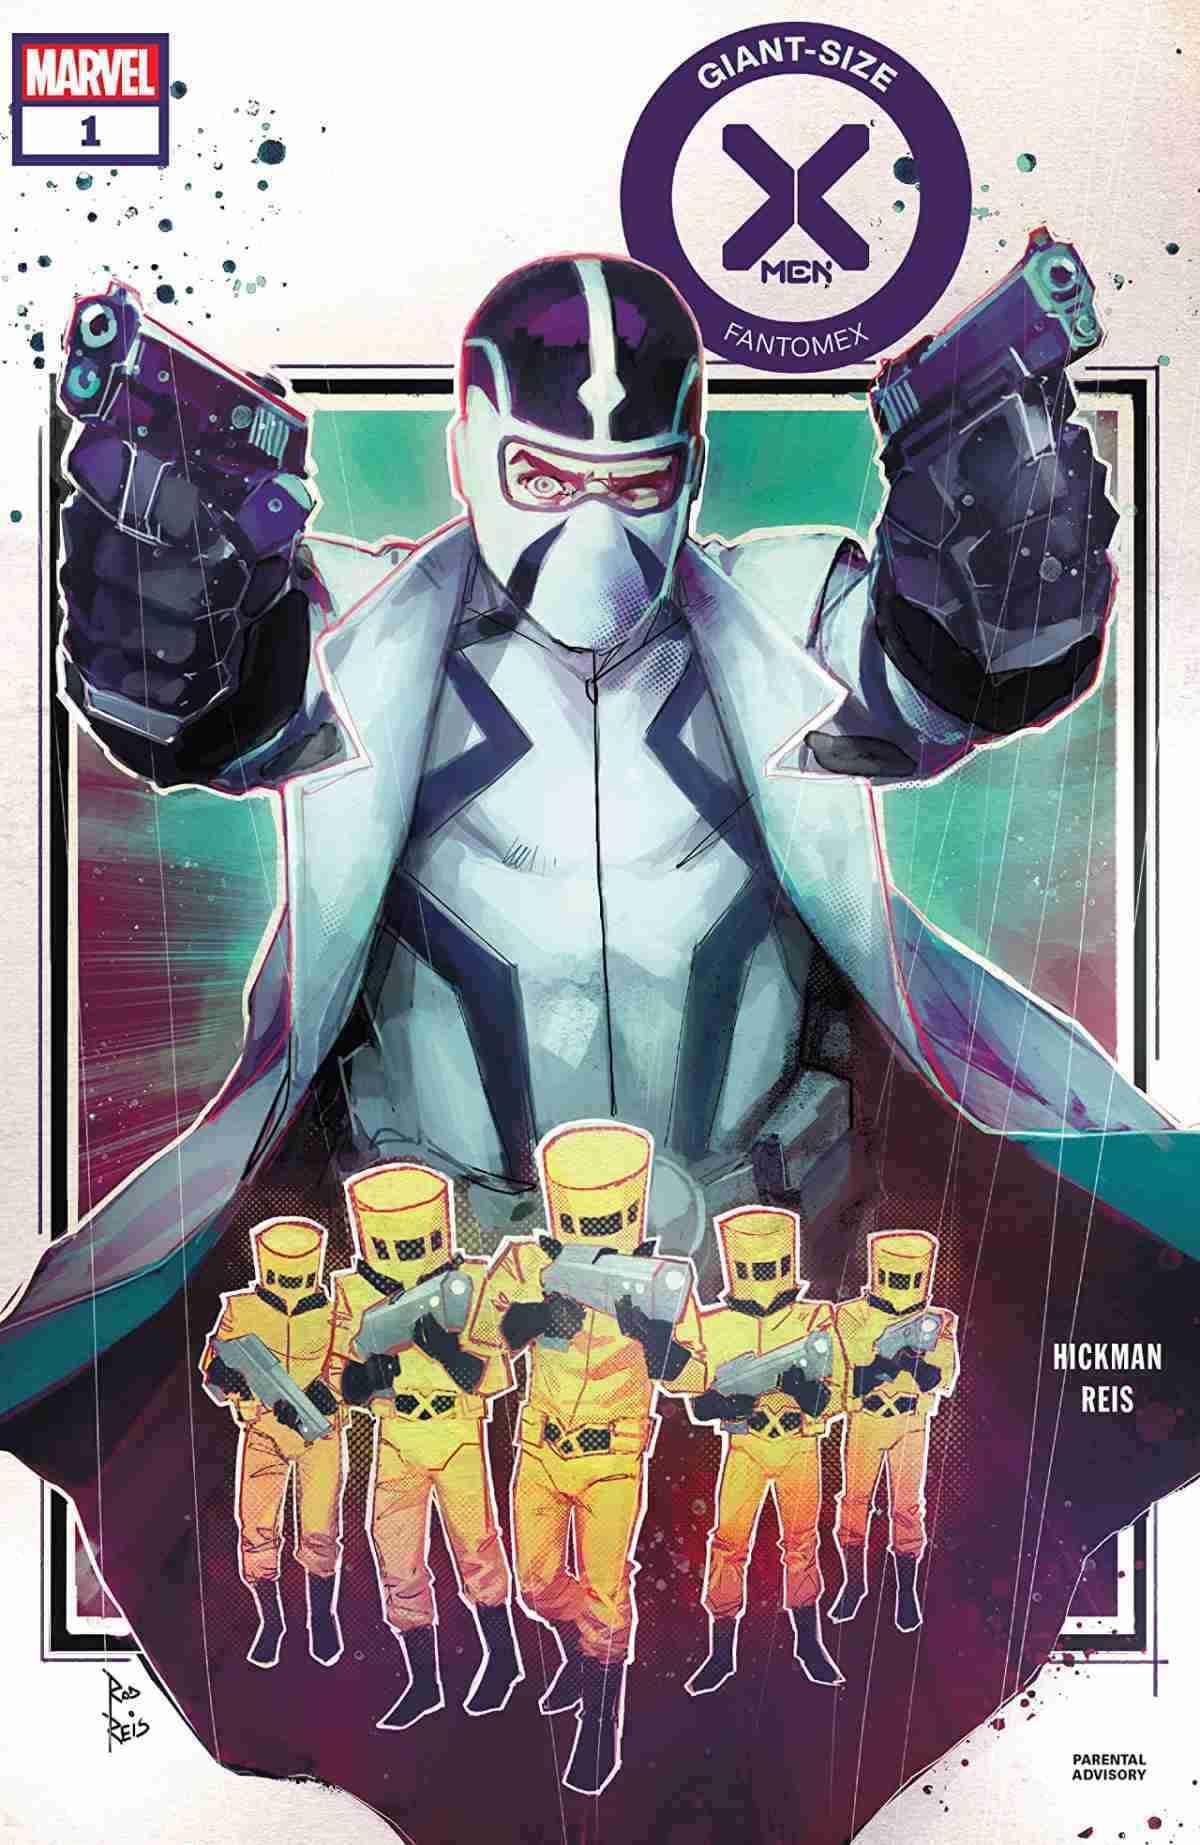 Giant-Size X-Men Fantomex #1